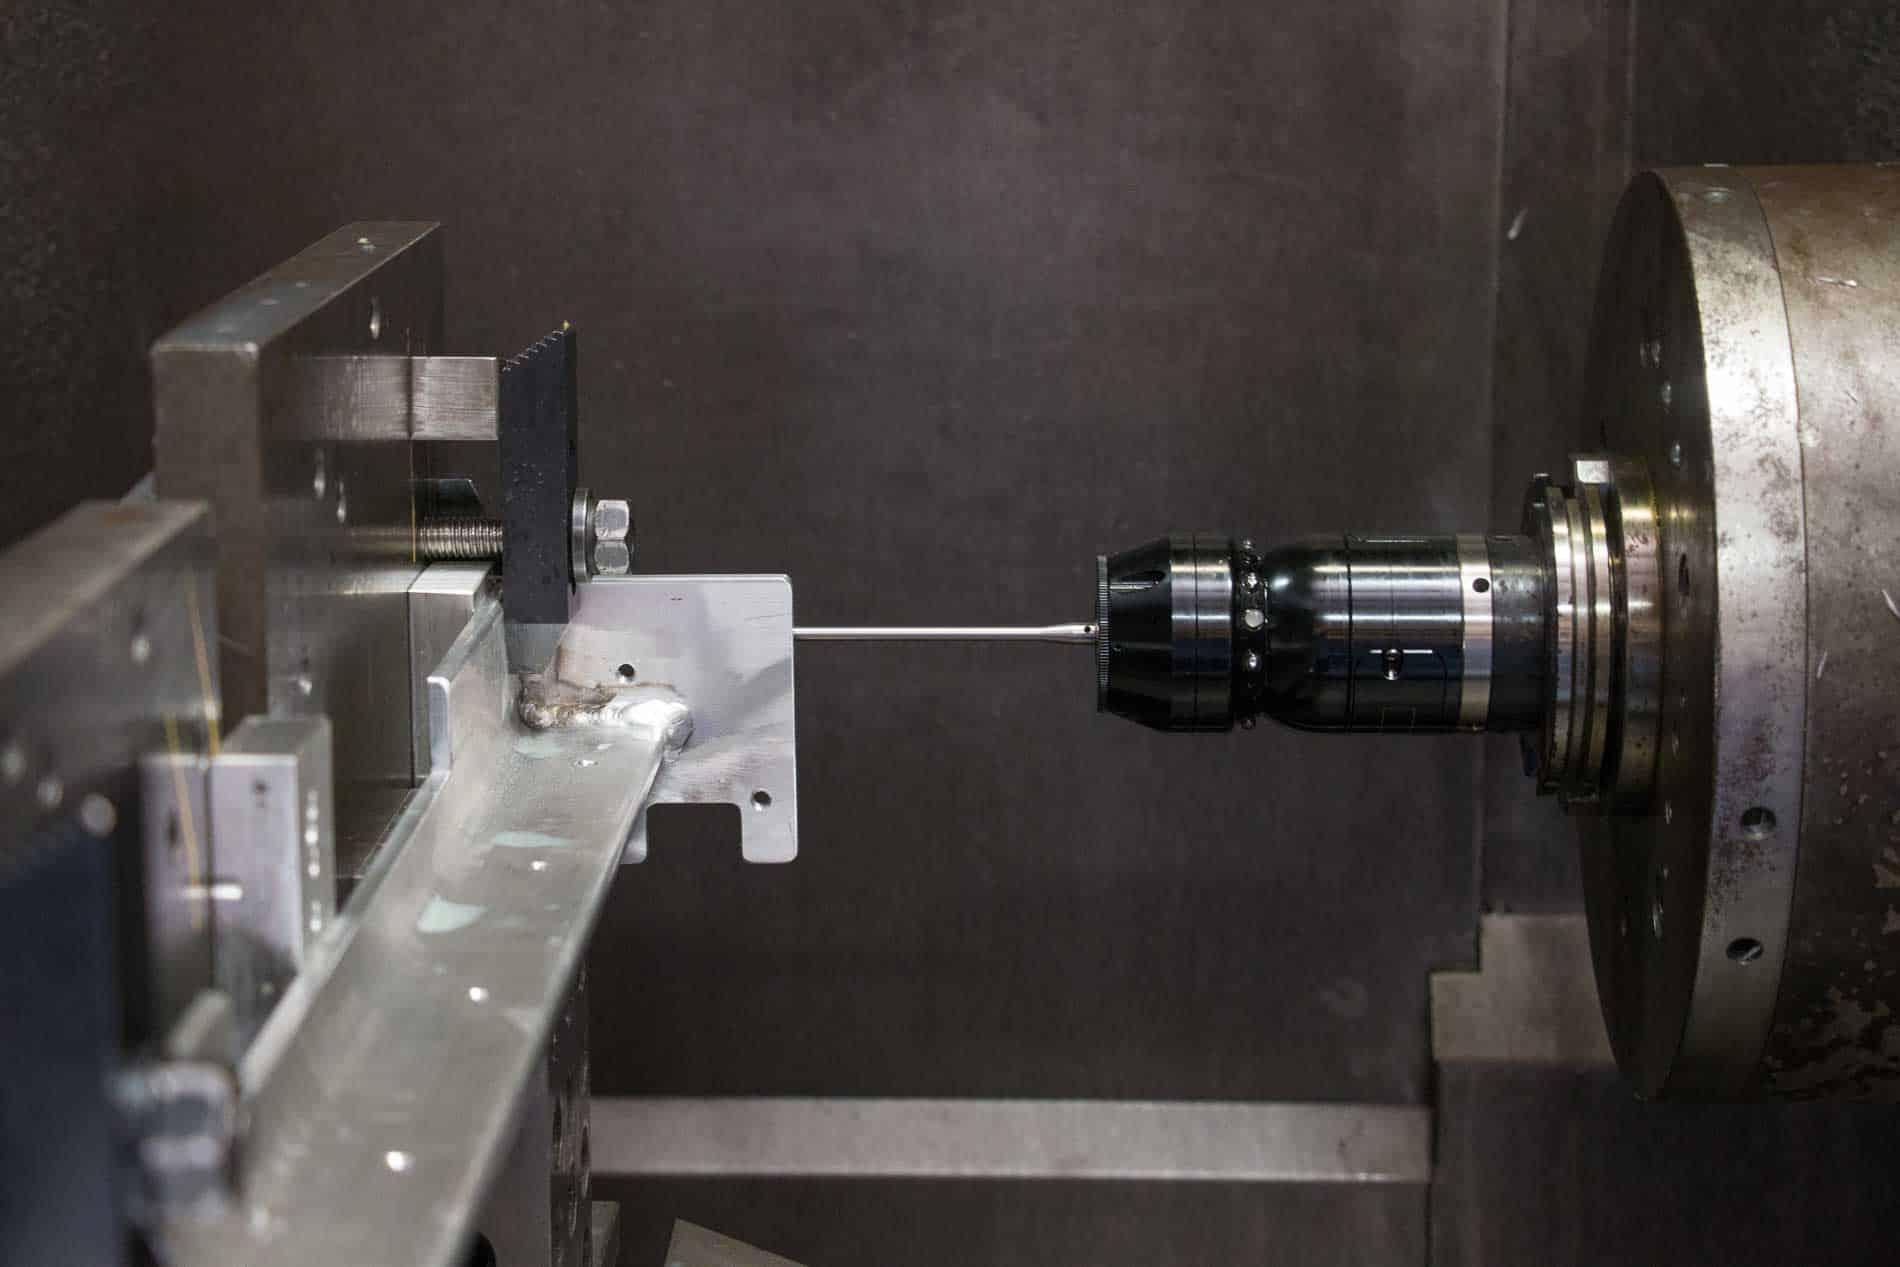 Horizontal Milling Machine Capabilities Boost Efficiency